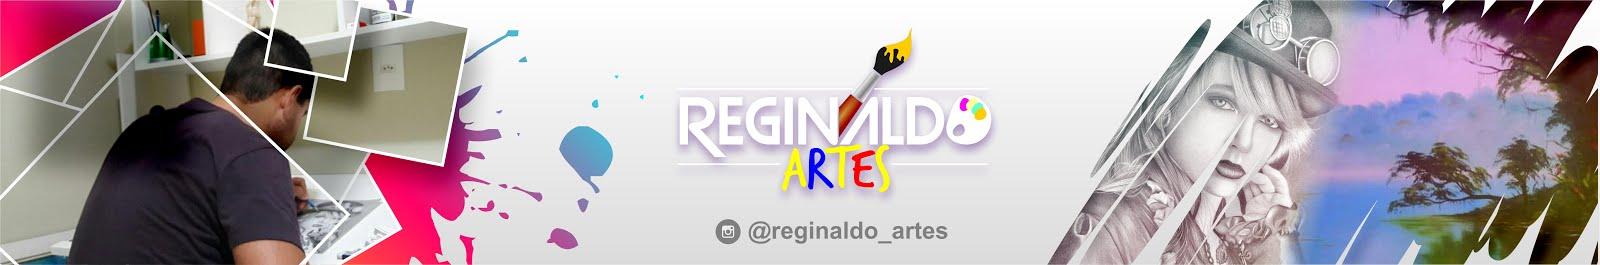 Reginaldo  Desenhos  Realistas